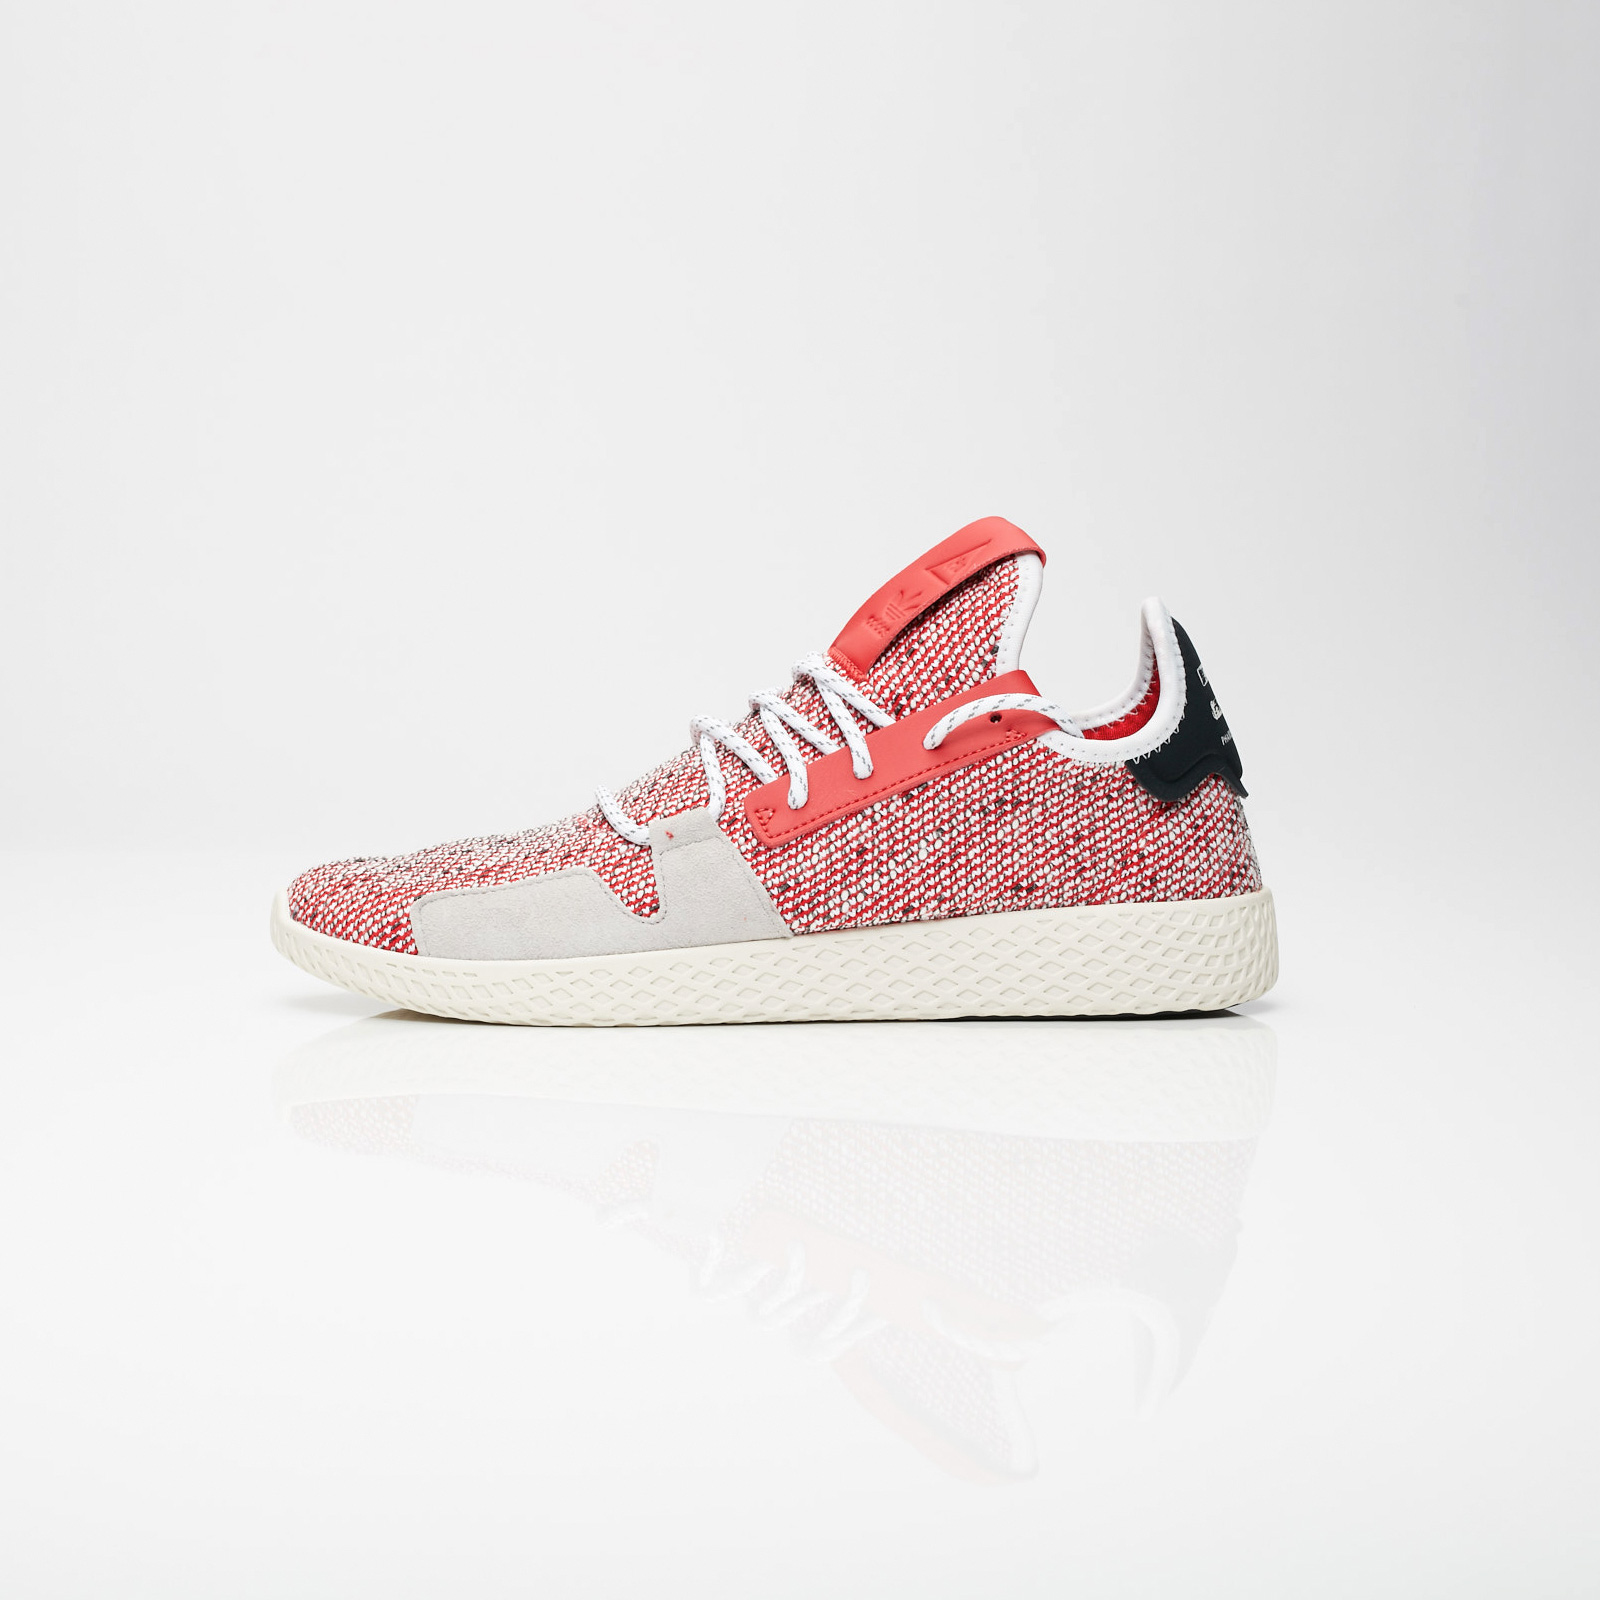 new style 22fd3 9bd4c ... adidas Originals Solar Tennis HU V2 x Pharrell Williams ...